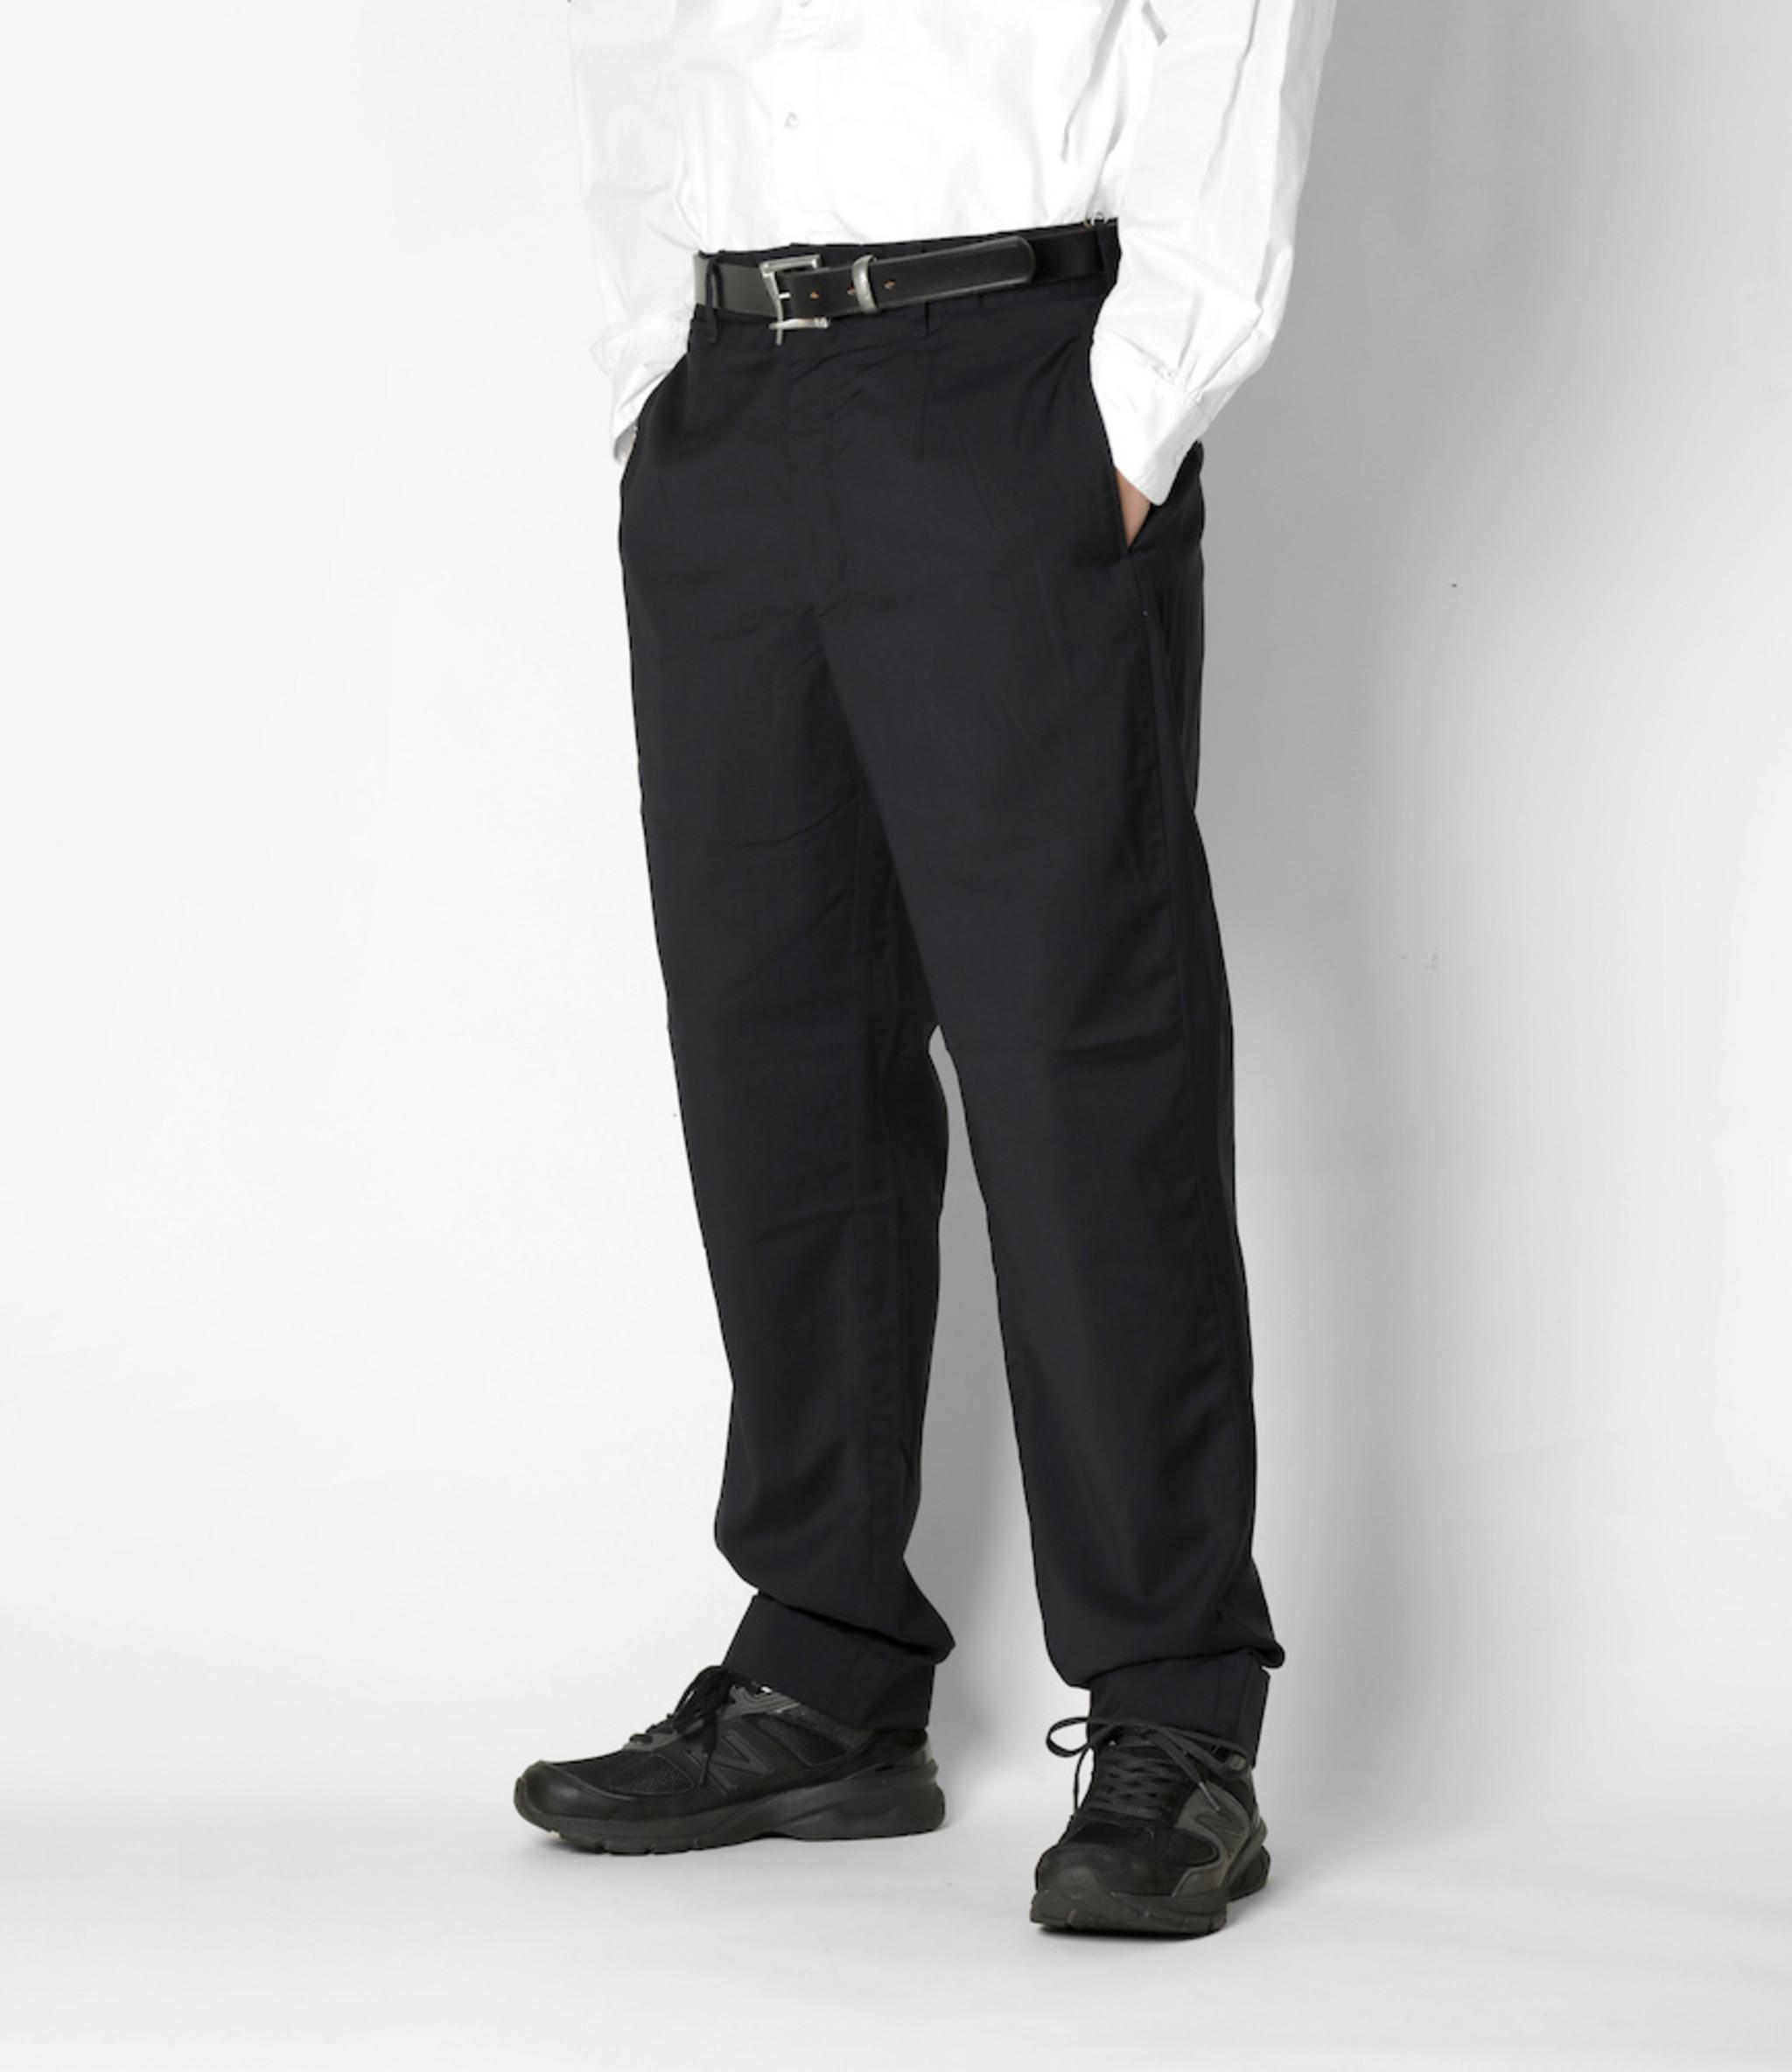 Engineered Garments Andover Pant - Dk.Navy Tropical Wool